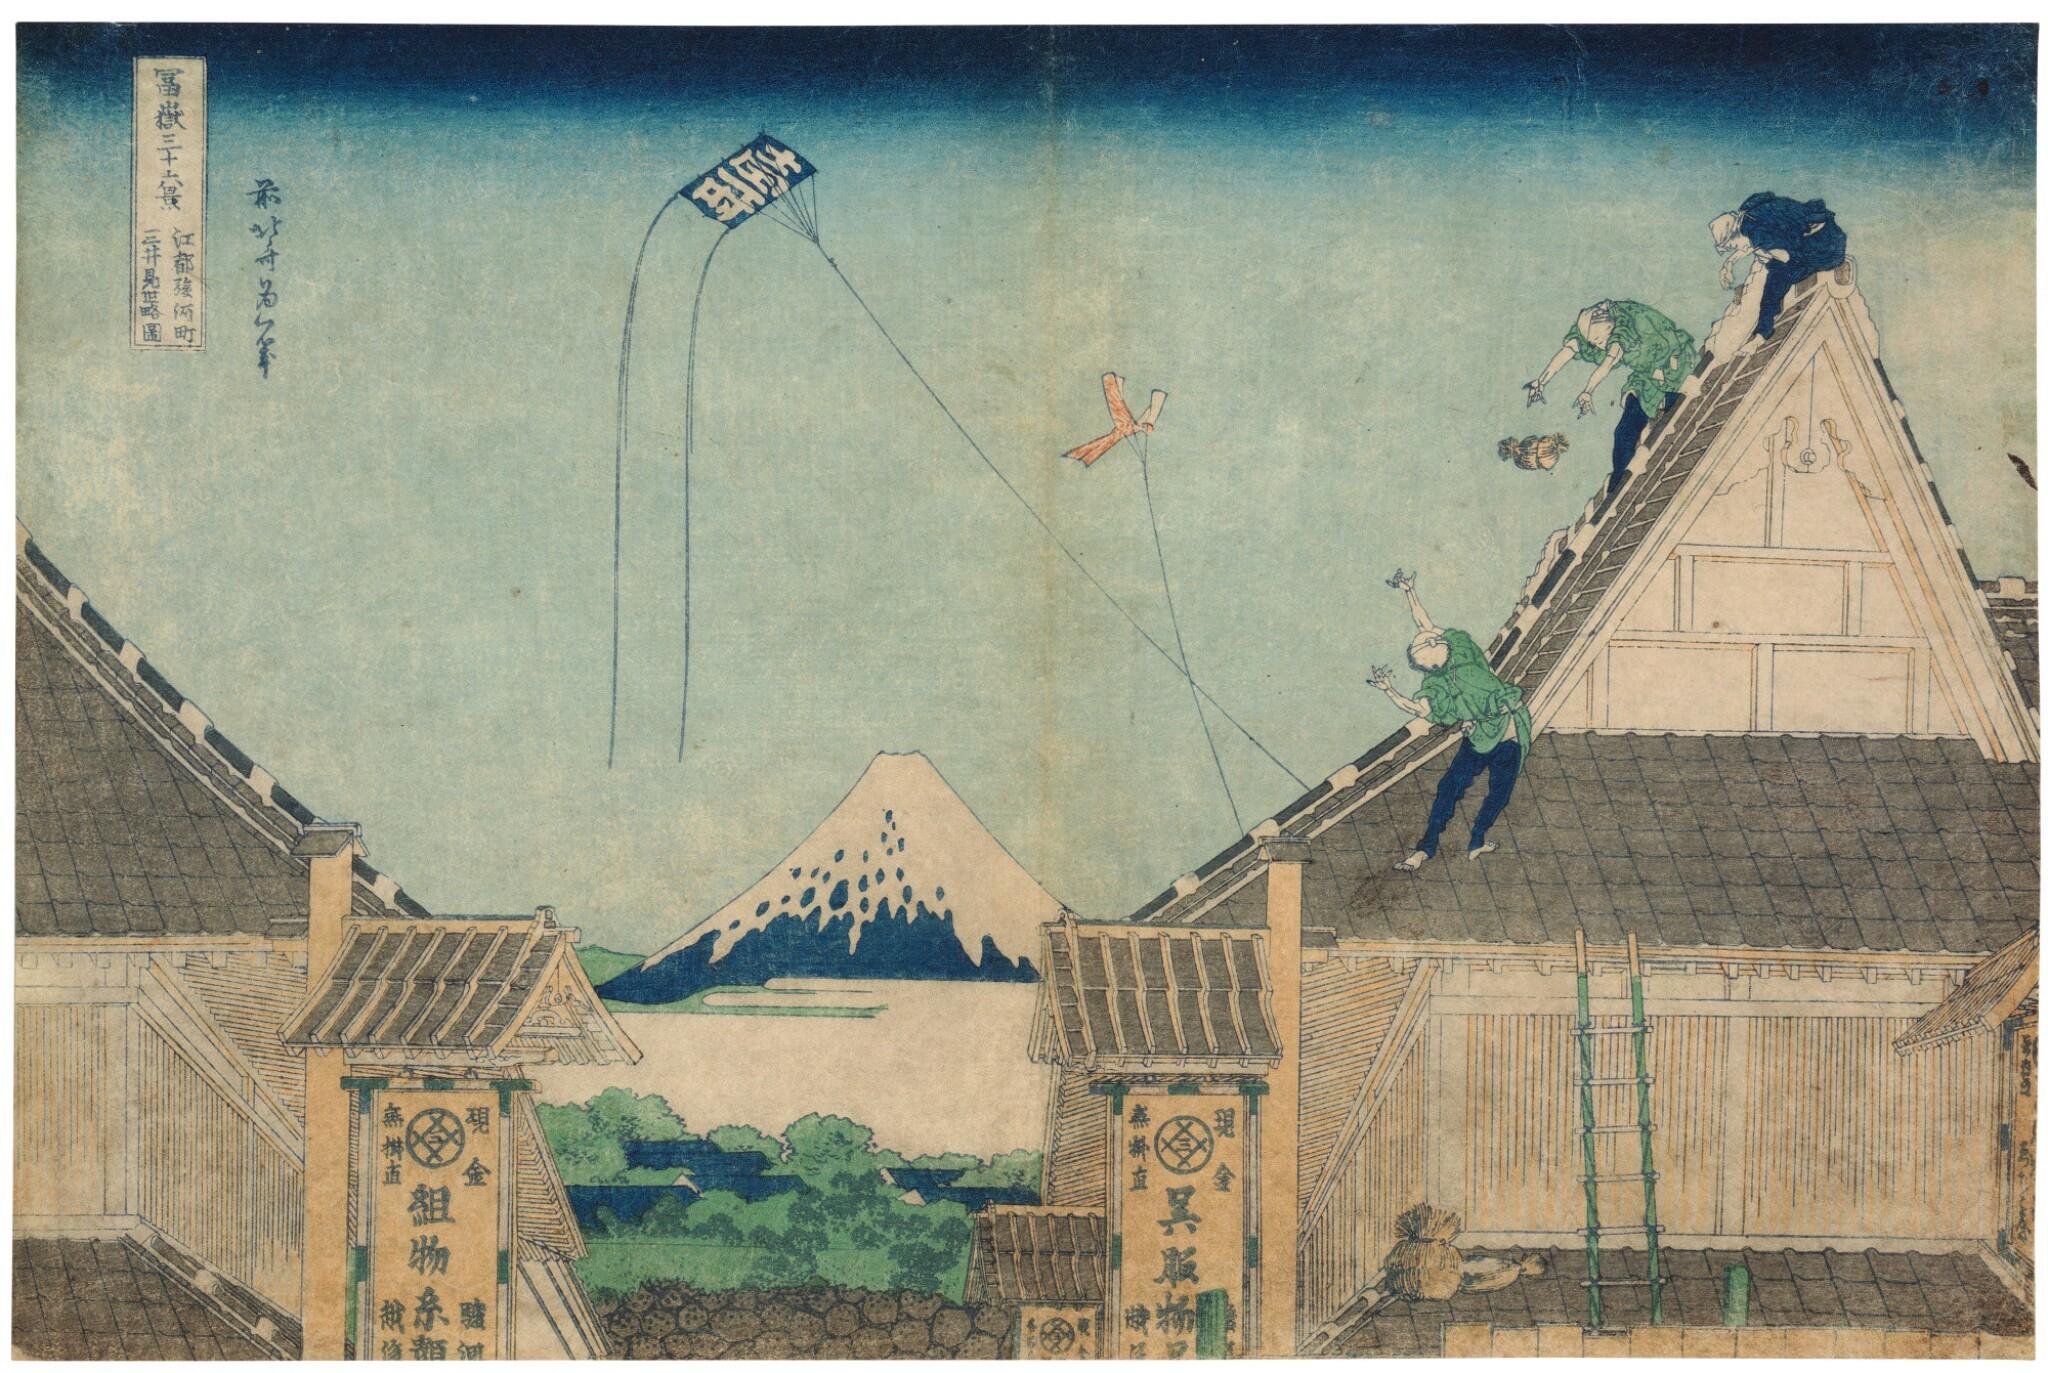 KATSUSHIKA HOKUSAI (1760–1849), EDO PERIOD, 19TH CENTURY   THE MITSUI SHOP AT SURUGA-CHÔ IN EDO (KÔTO SURUGA-CHÔ MITSUI-MISE RYAKUZU)